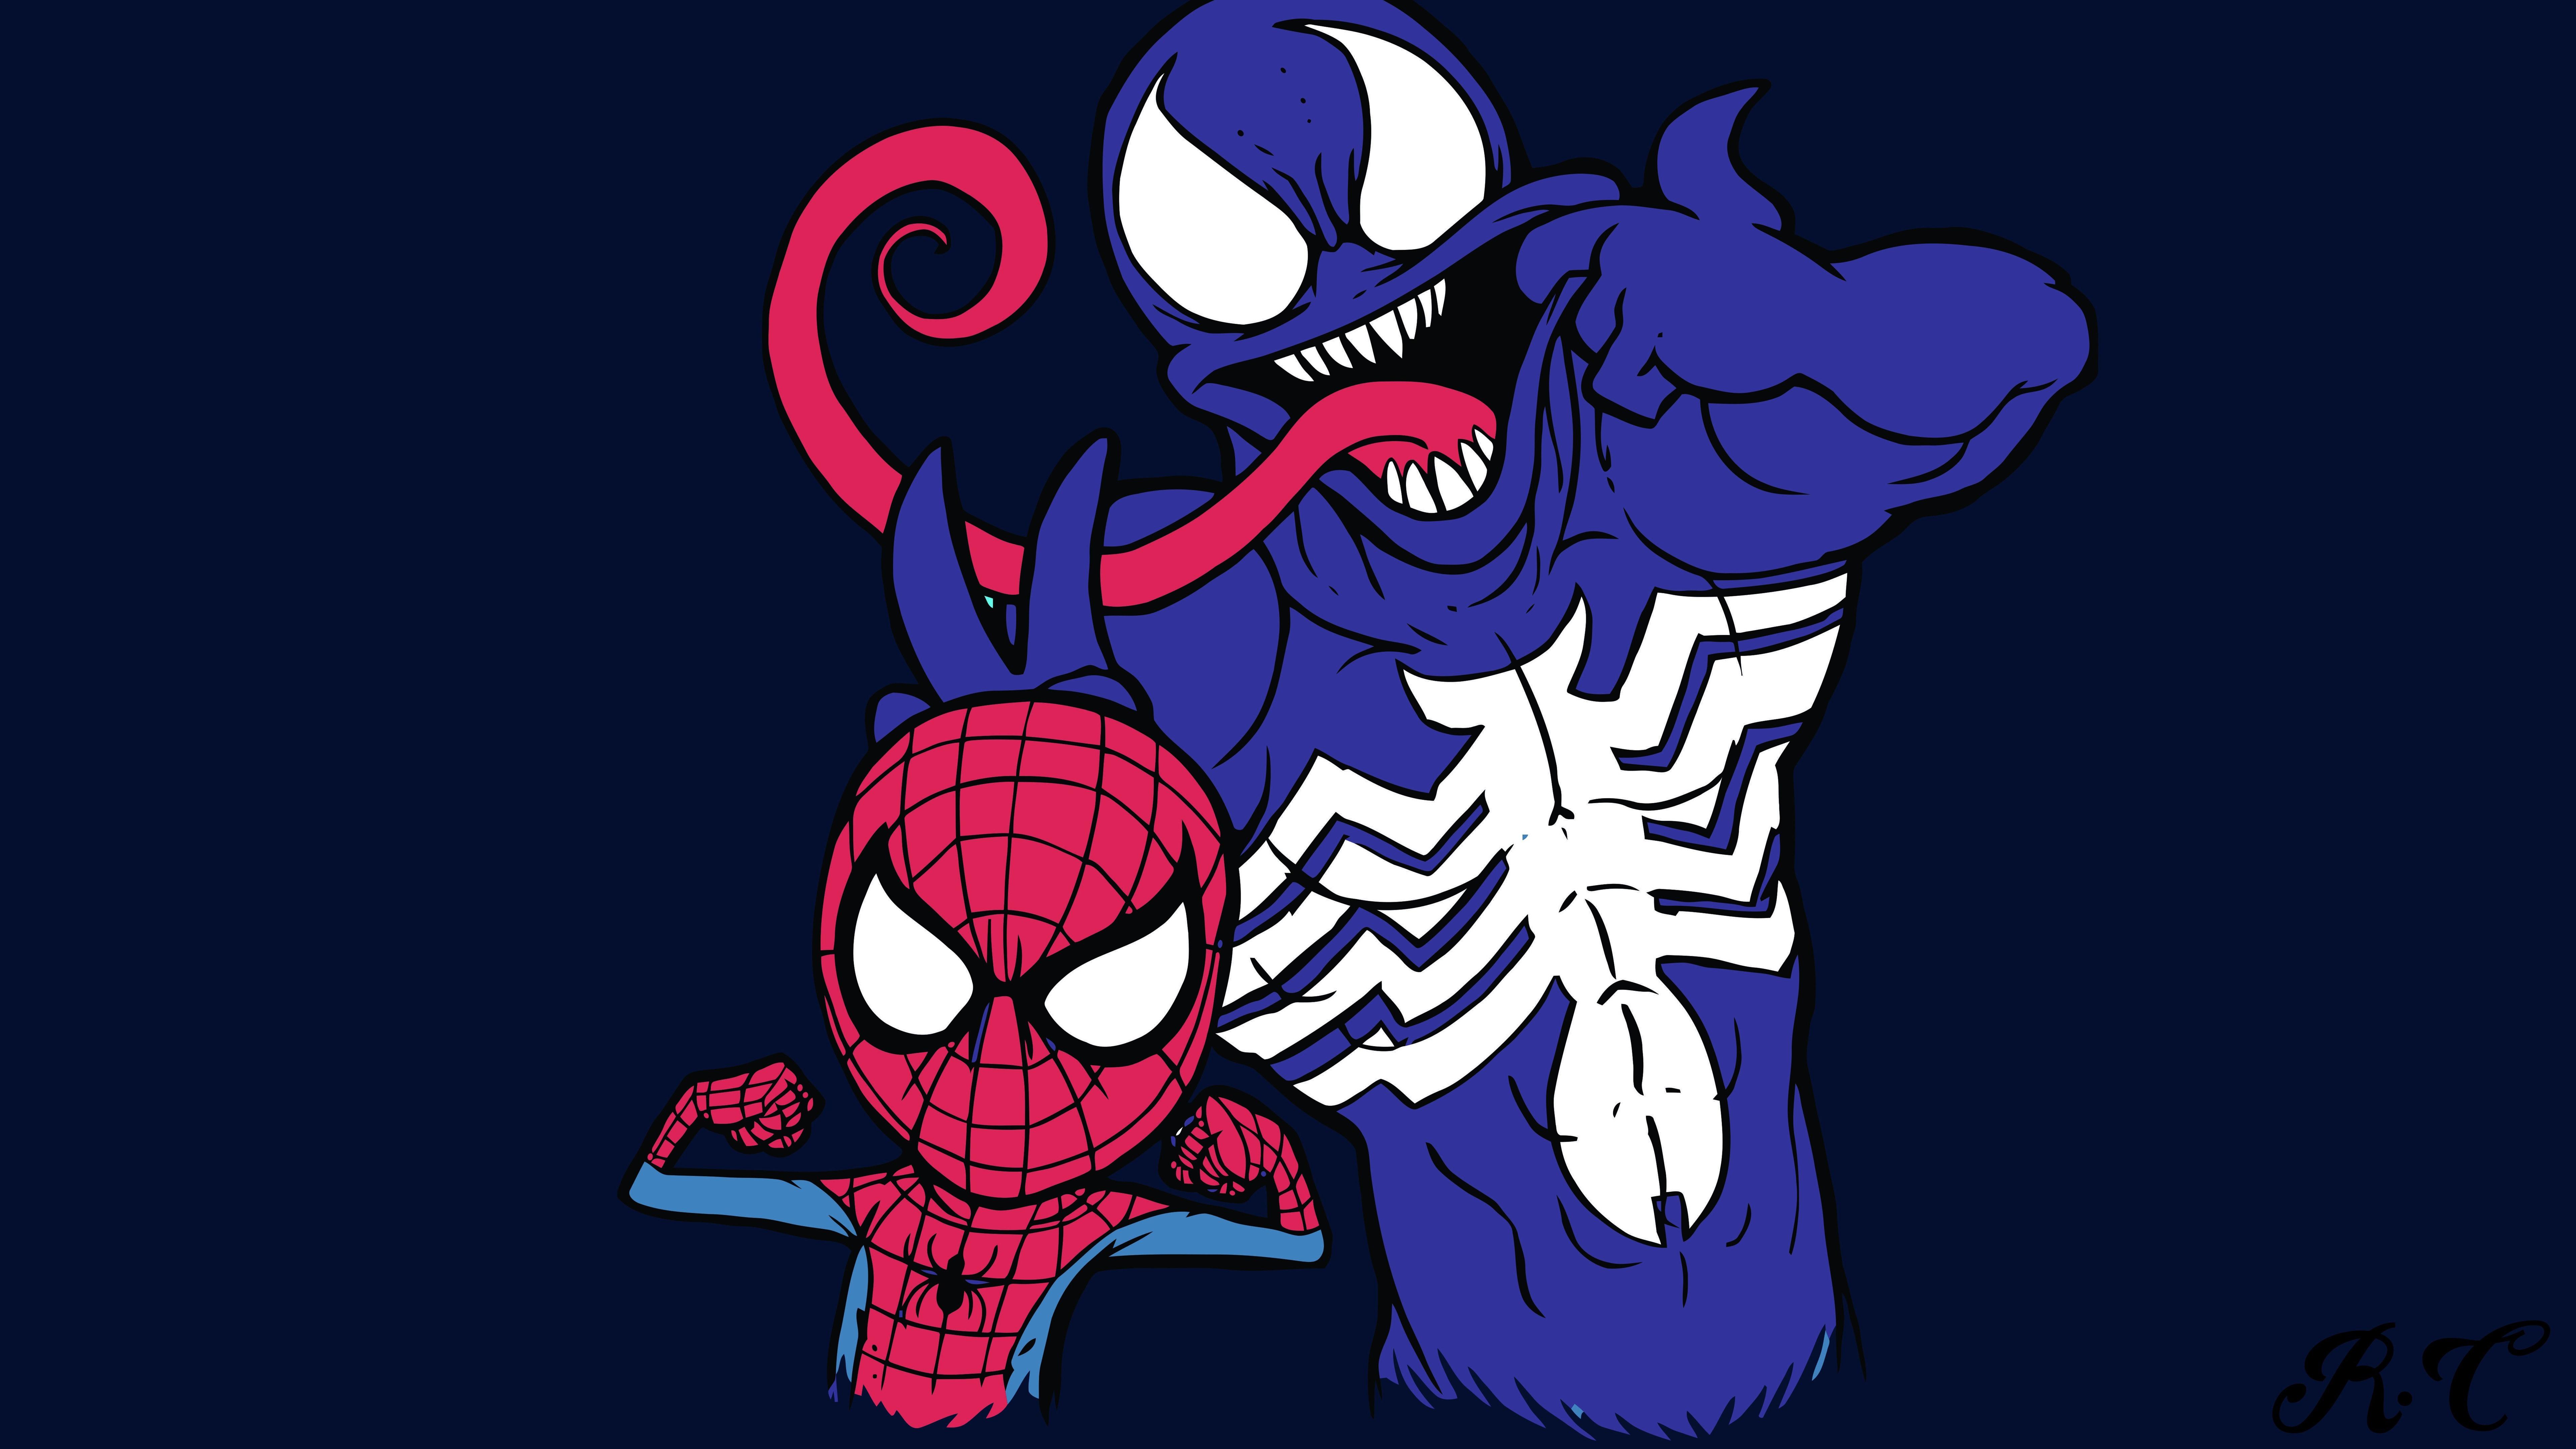 Fondos De Pantalla Spider-Man Y Venom, DC Comics 7680x4320